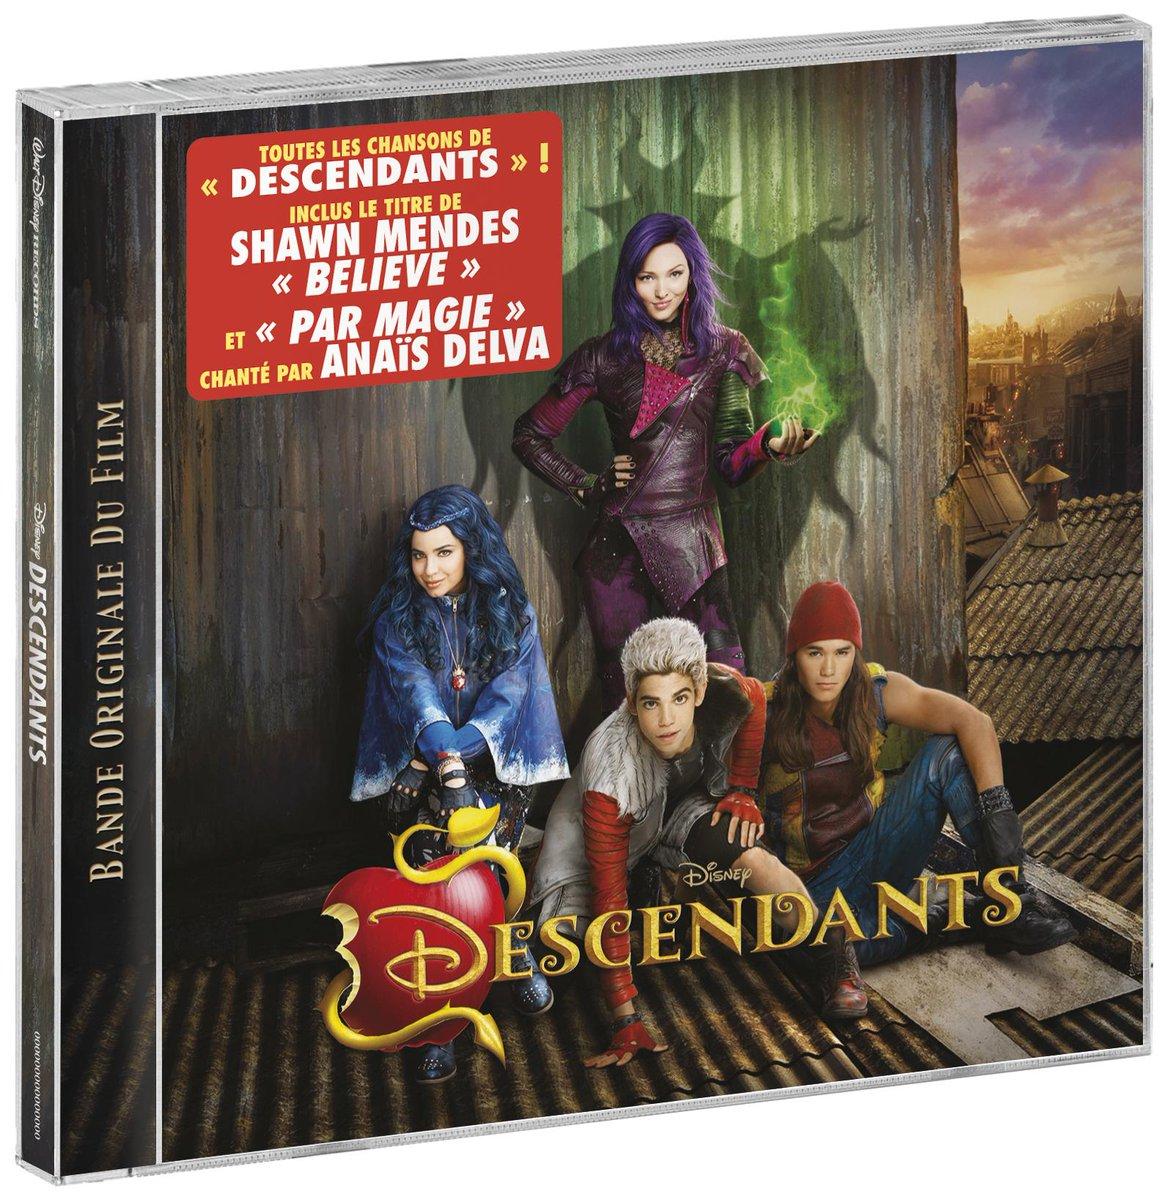 "Disney Channel on Twitter: ""A gagner : un DVD #Descendants ..."